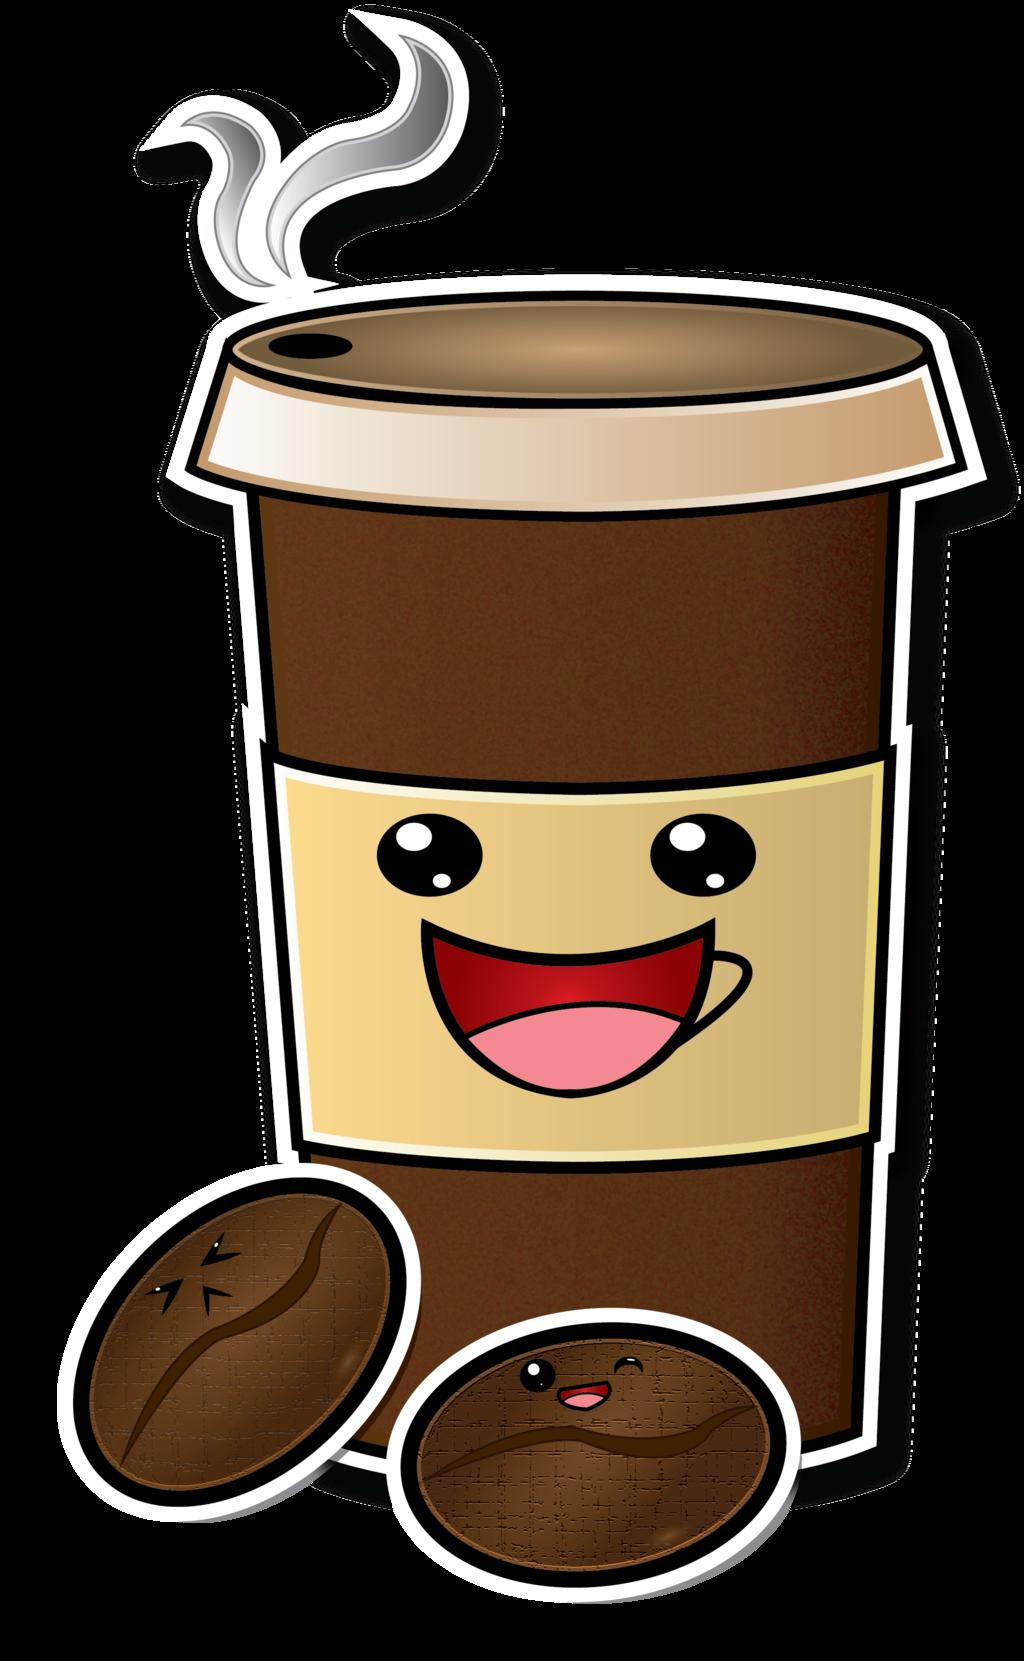 Cute Cartoon Coffee Cup Drawing | Coffee cartoon, Coffee ...